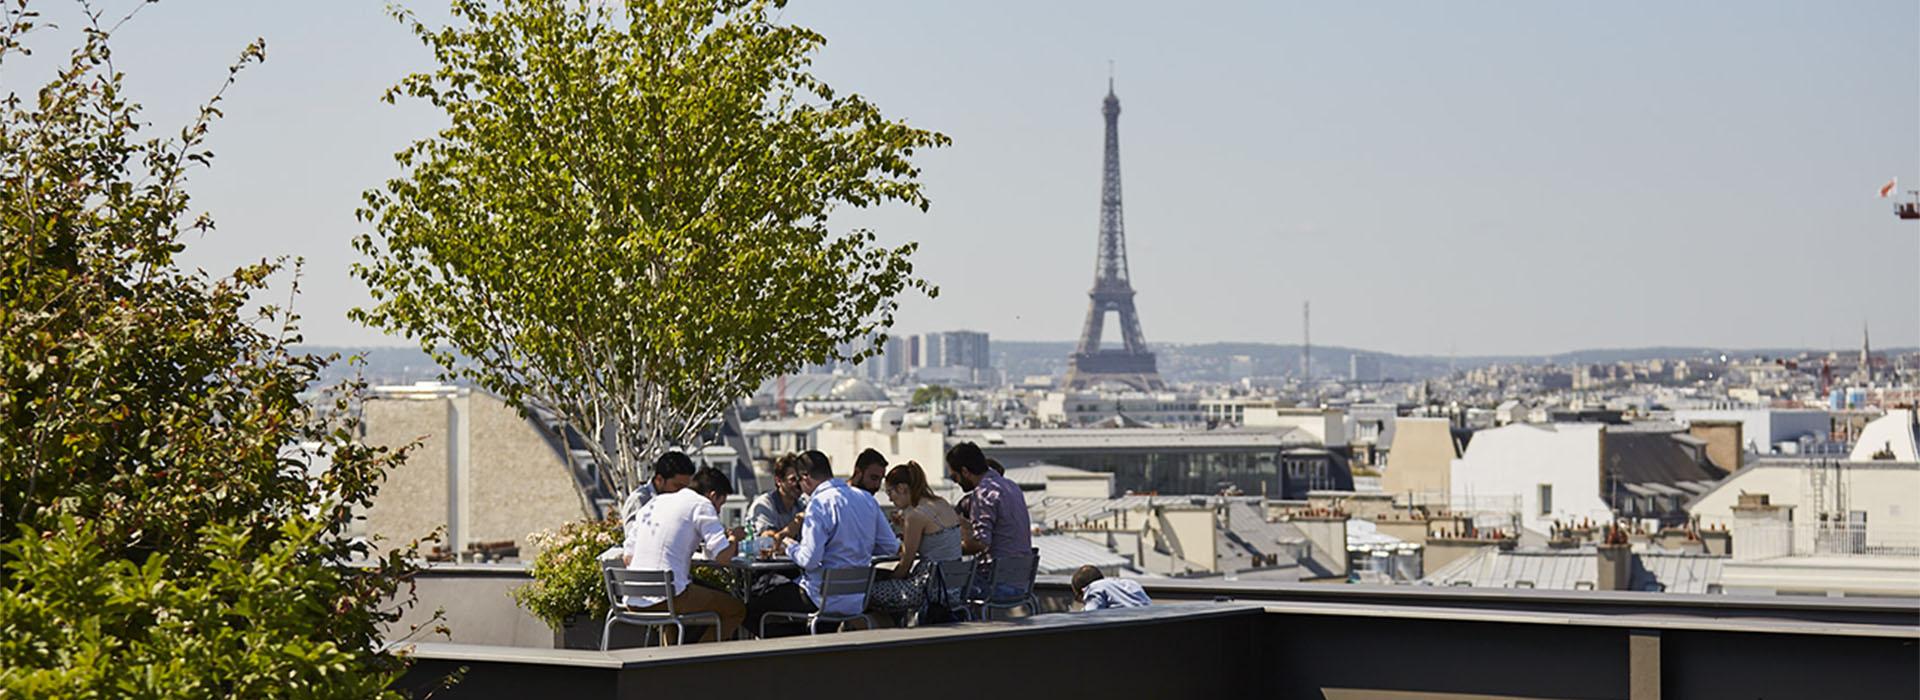 Lunch on Paris rooftop eiffel